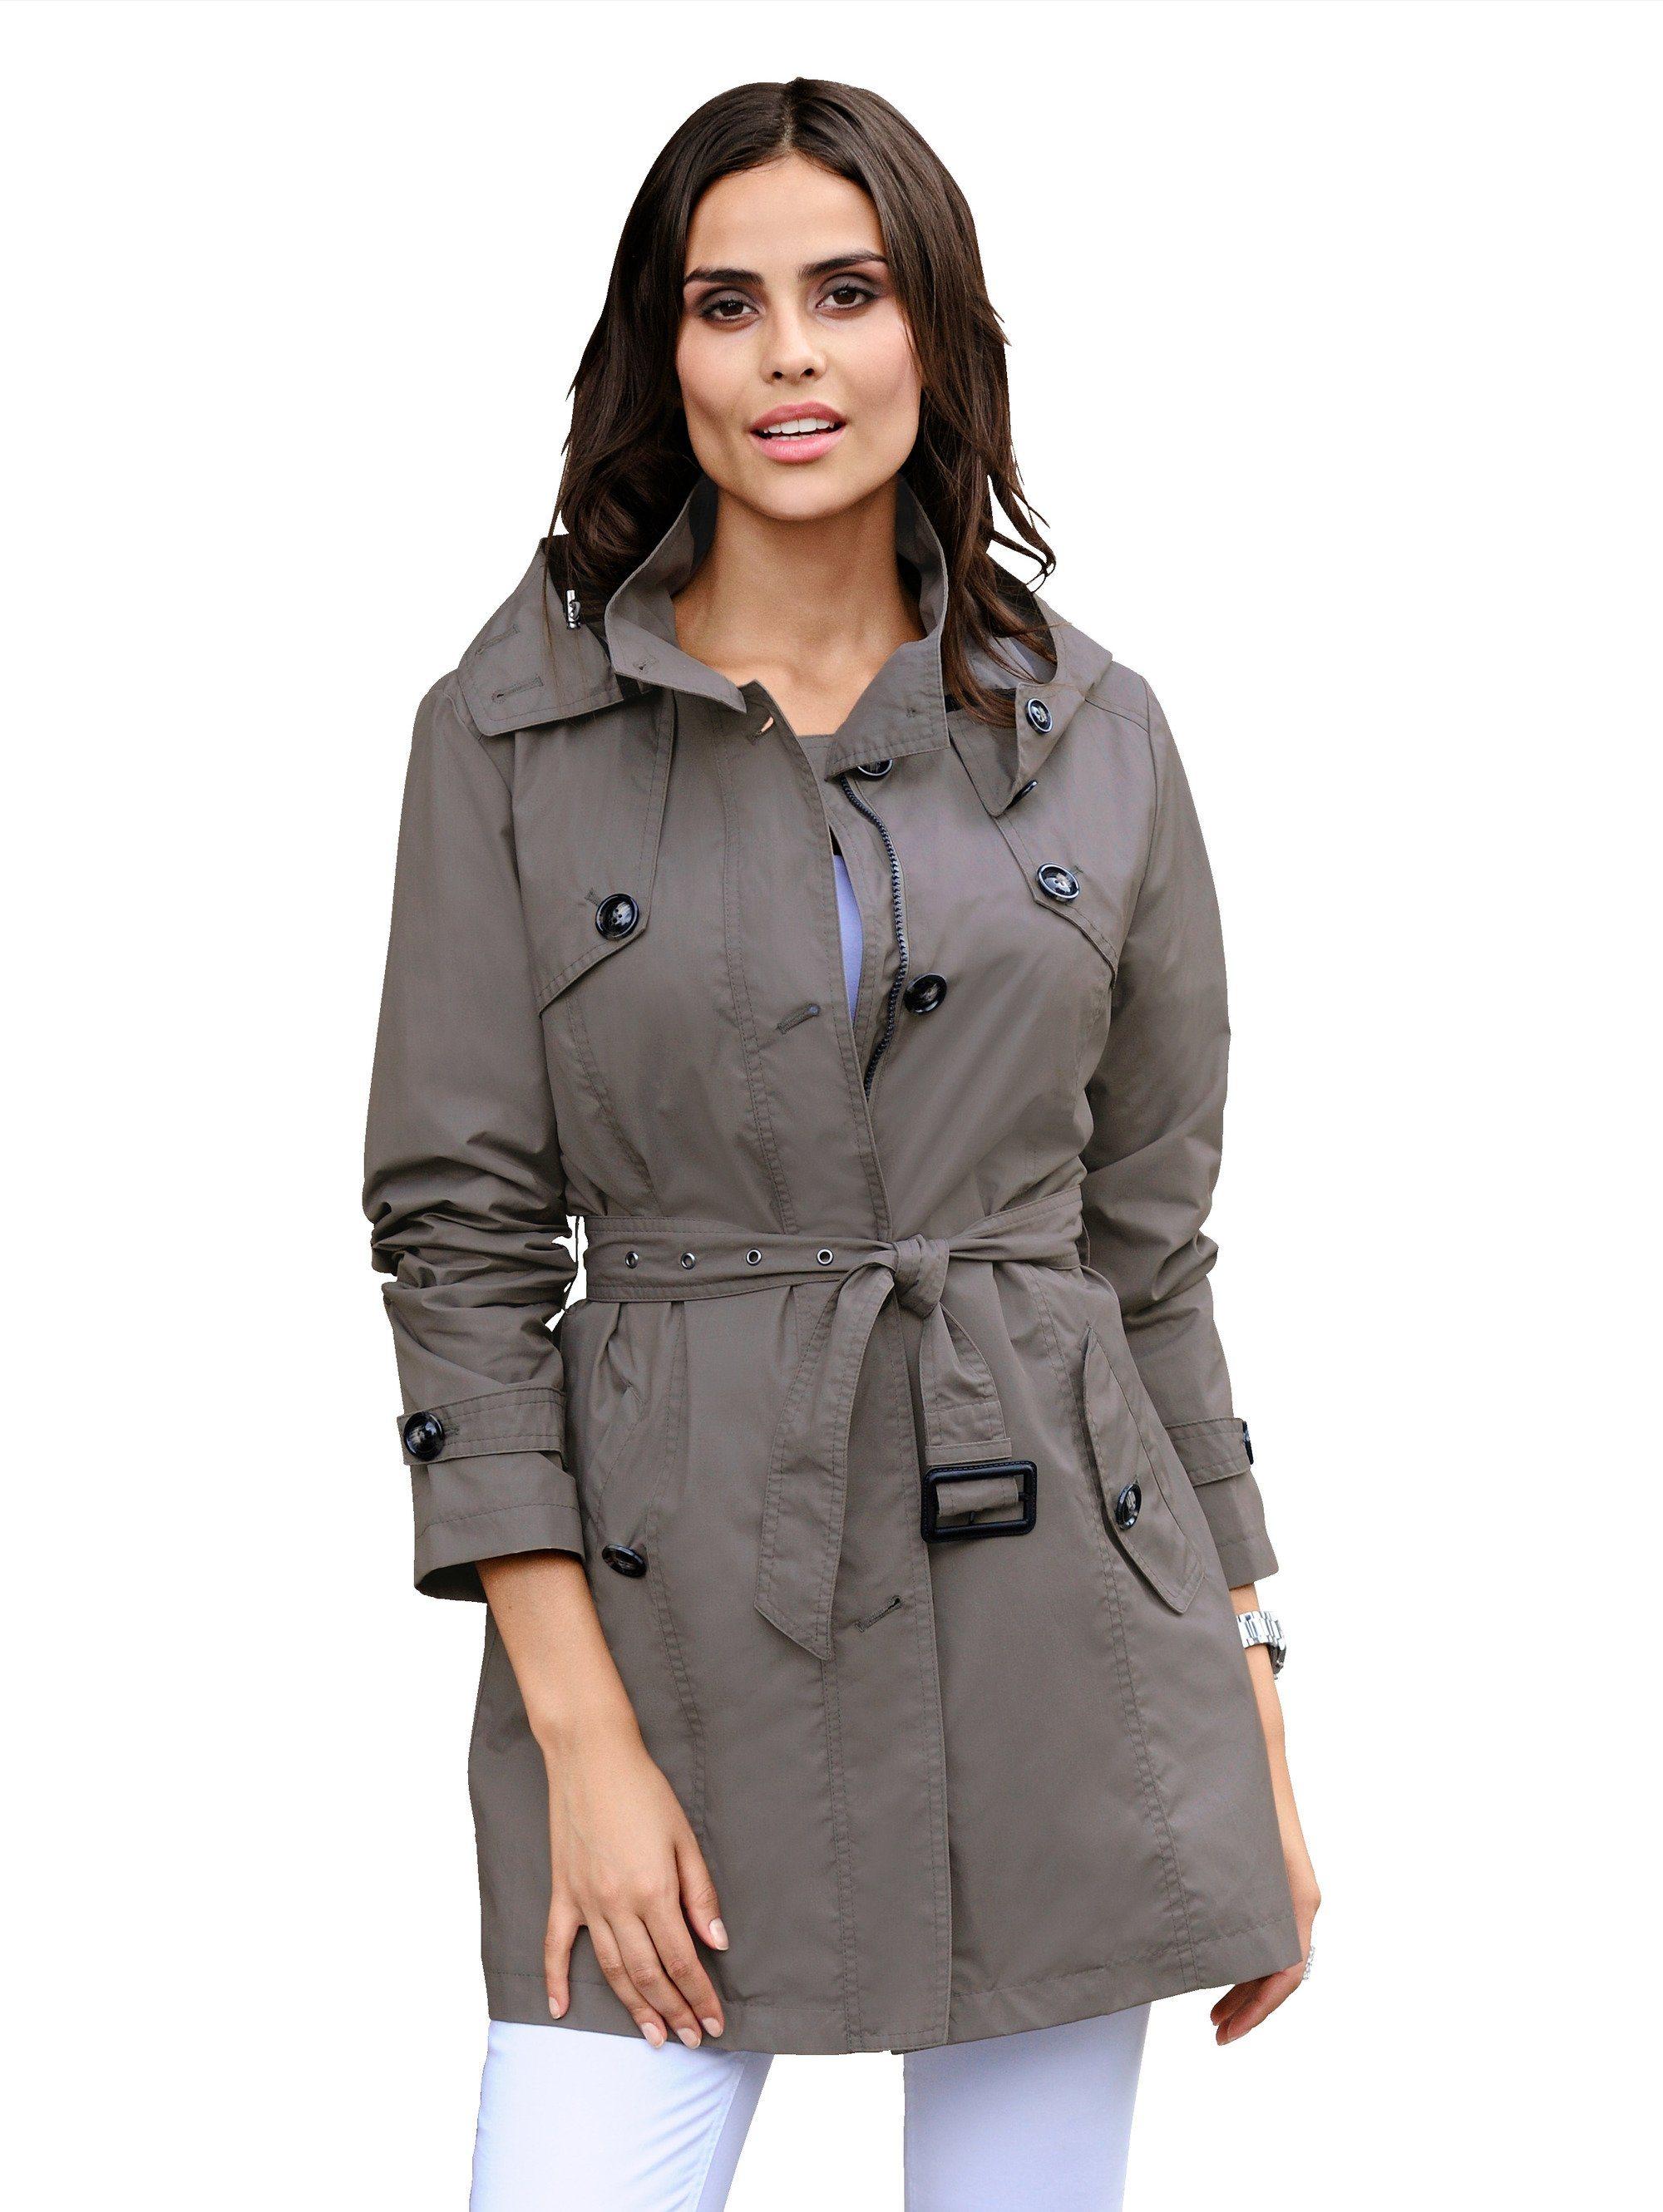 Alba Moda Trenchcoat mit abknöpfbarer Kapuze | Bekleidung > Mäntel > Trenchcoats | Baumwolle - Polyamid - Polyester | Alba Moda